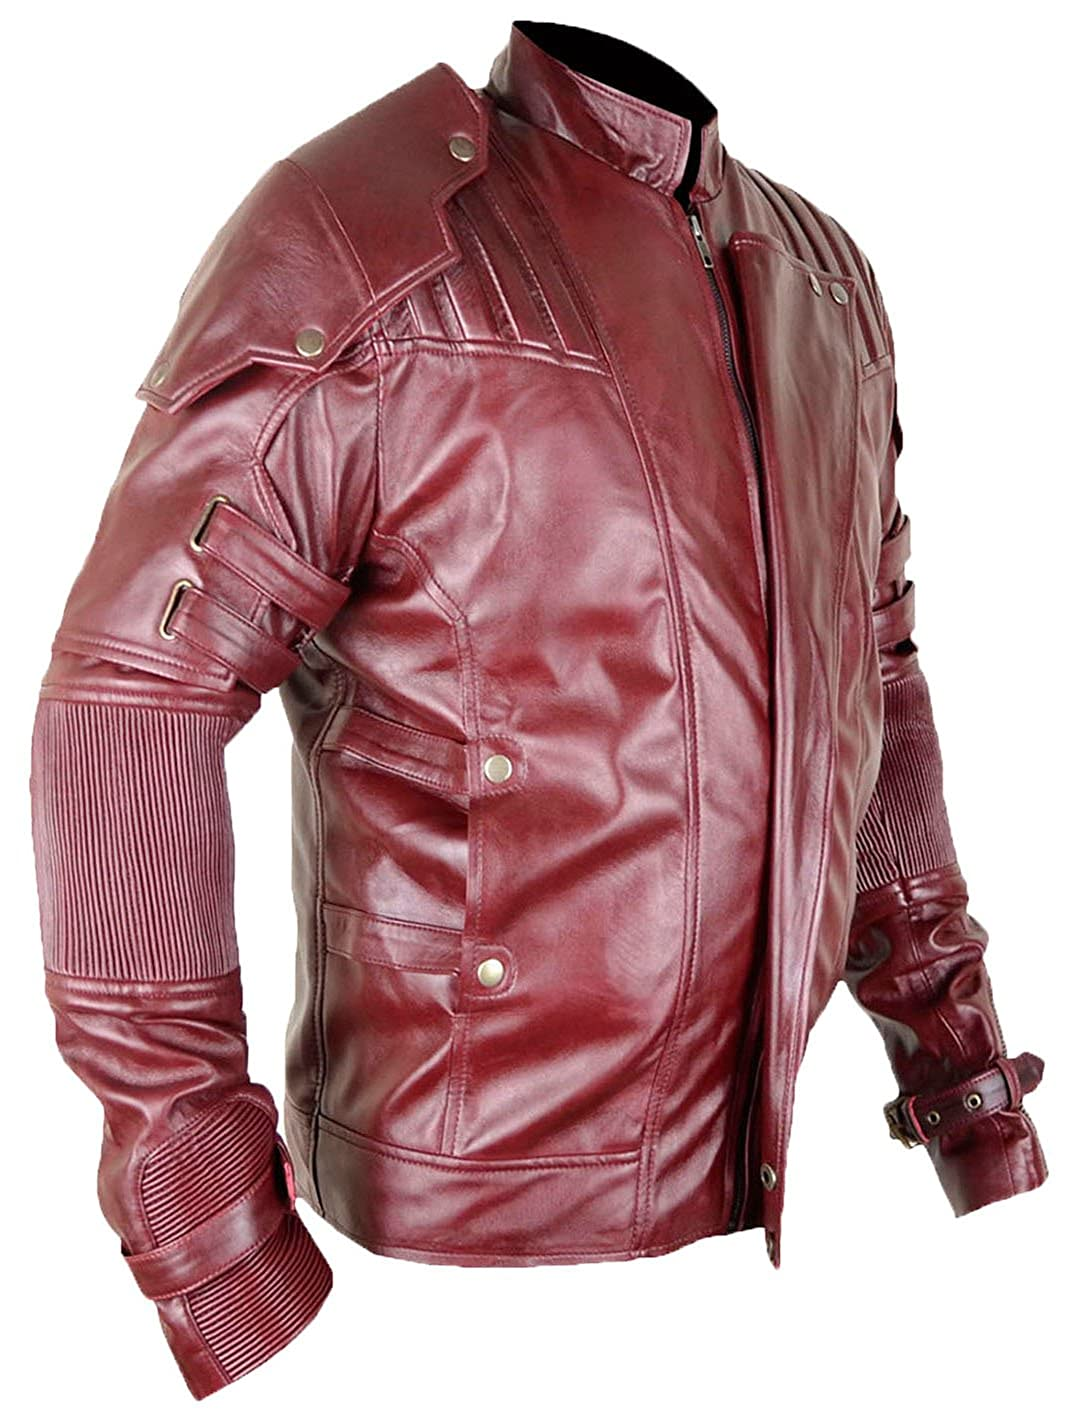 Amazon.com: mshc Guardianes de la Galaxia 2 Star Lord Peter ...